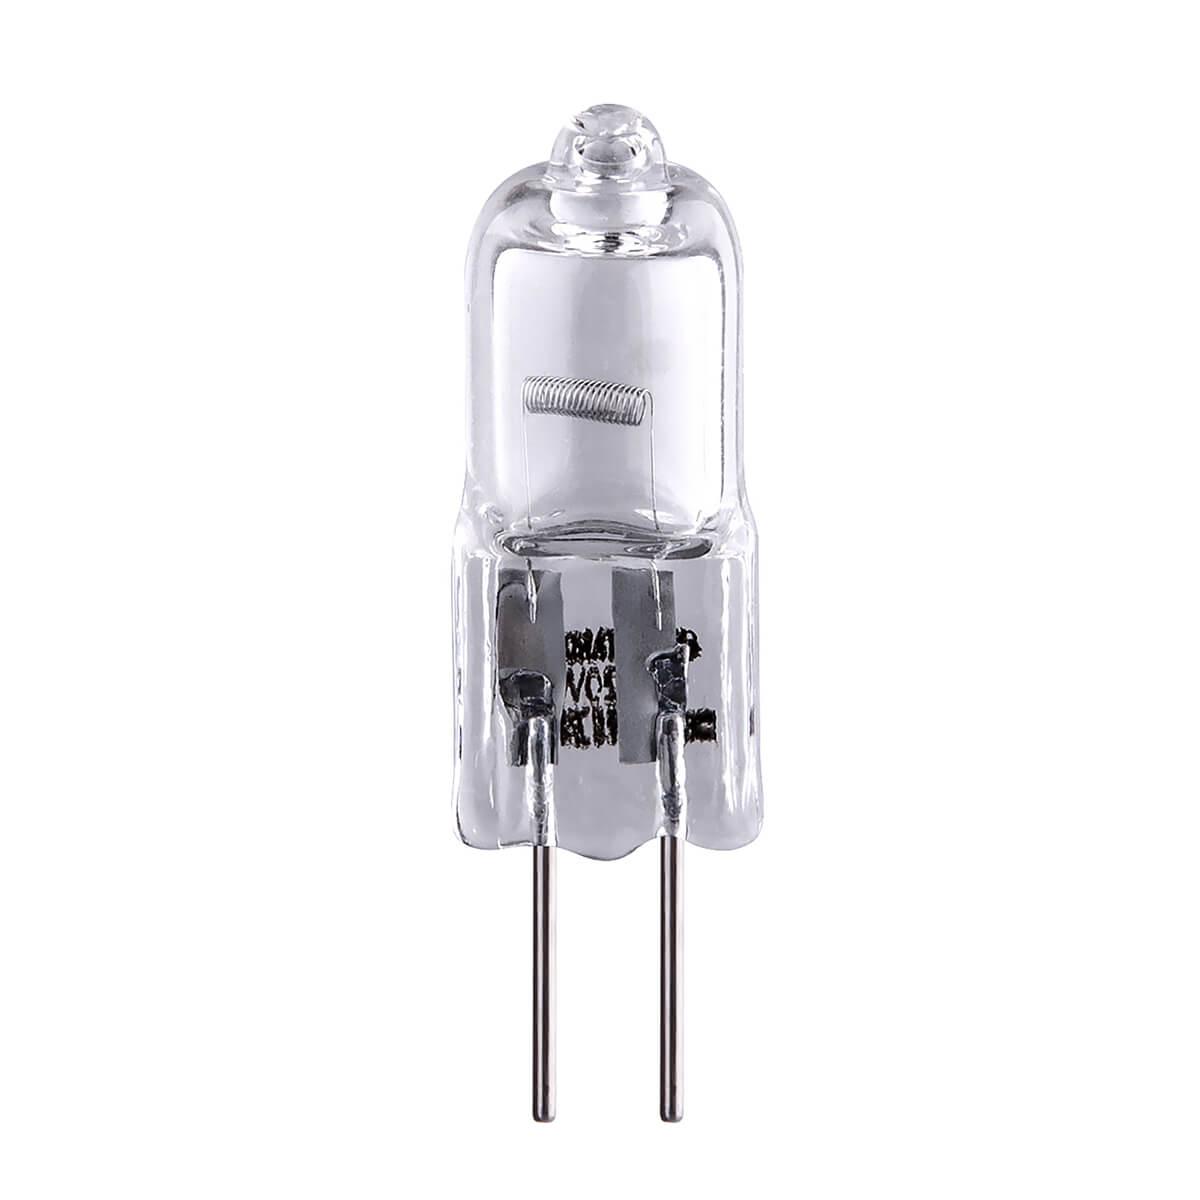 Лампочка Elektrostandard 4607138147025 Гало